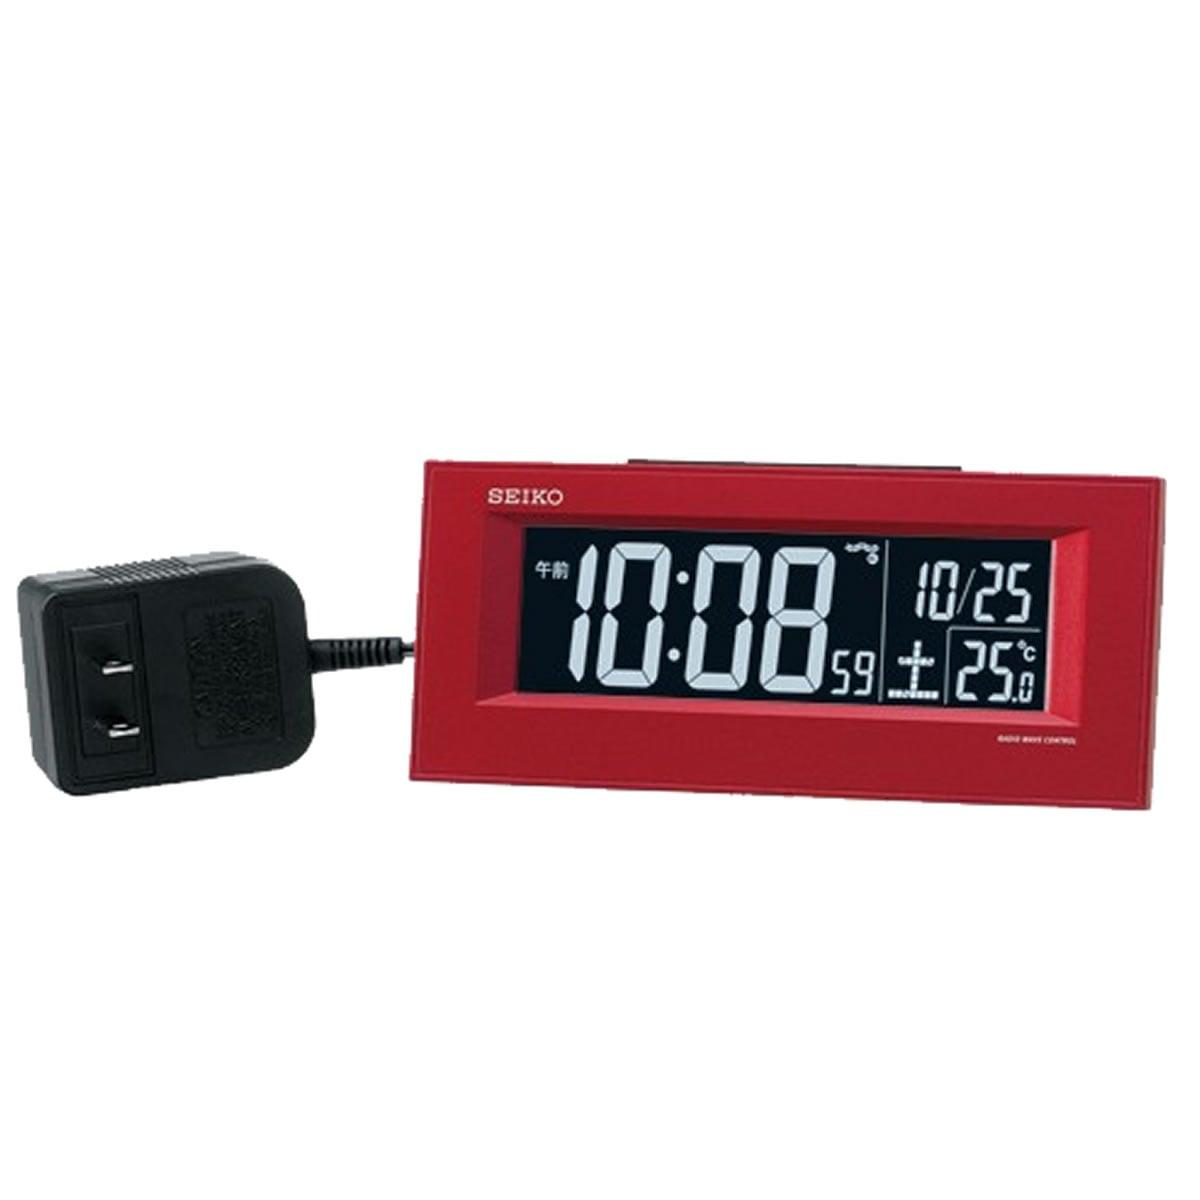 SEIKO セイコー 夜でも見える アラーム付 デジタル電波置き時計 DL209R 赤